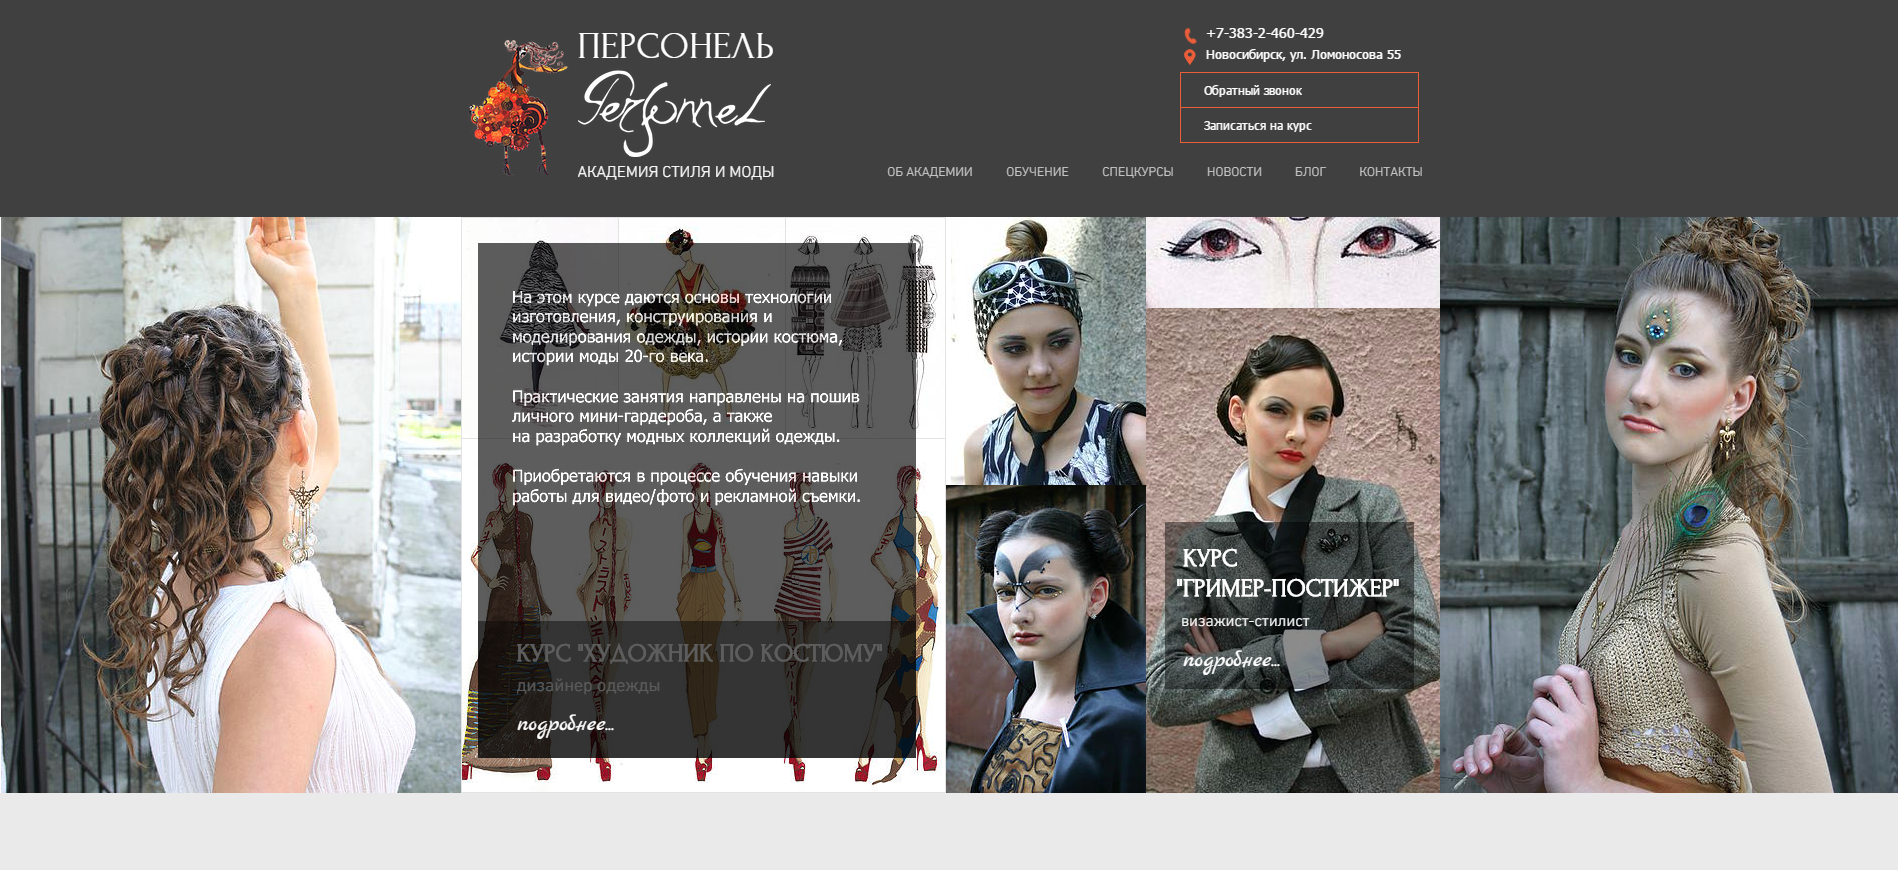 Сайт учебного центра моды